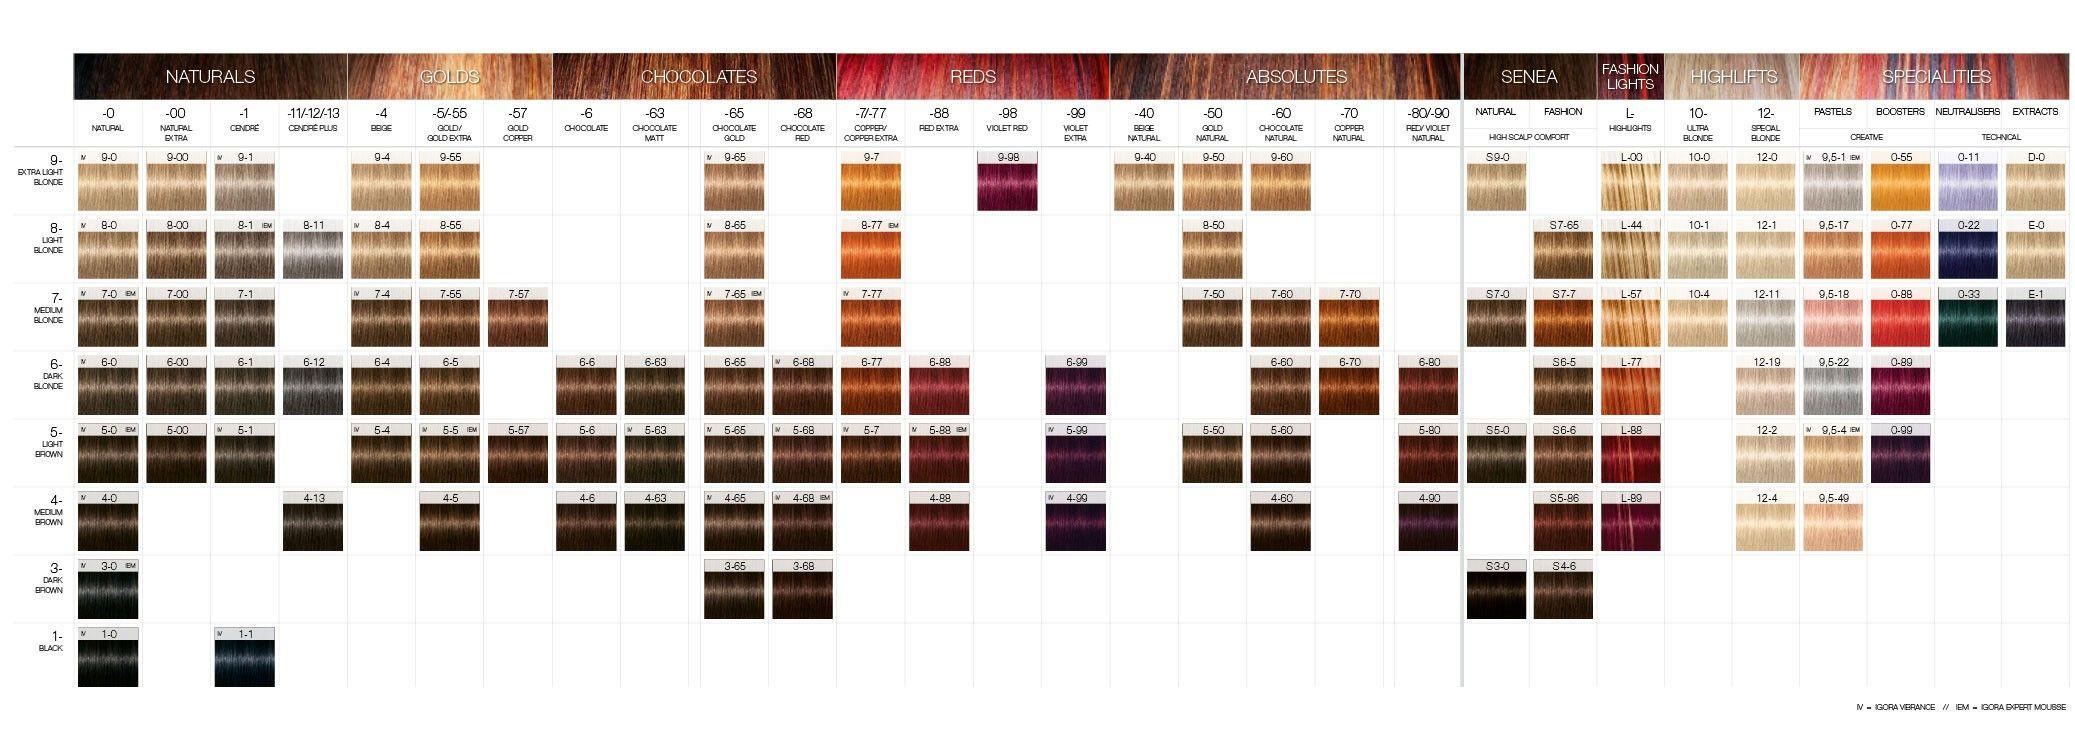 Schwarzkopf Igora Redken Color Fusion Chart Schwarzkopf Hair Color Schwarzkopf Hair Color Chart